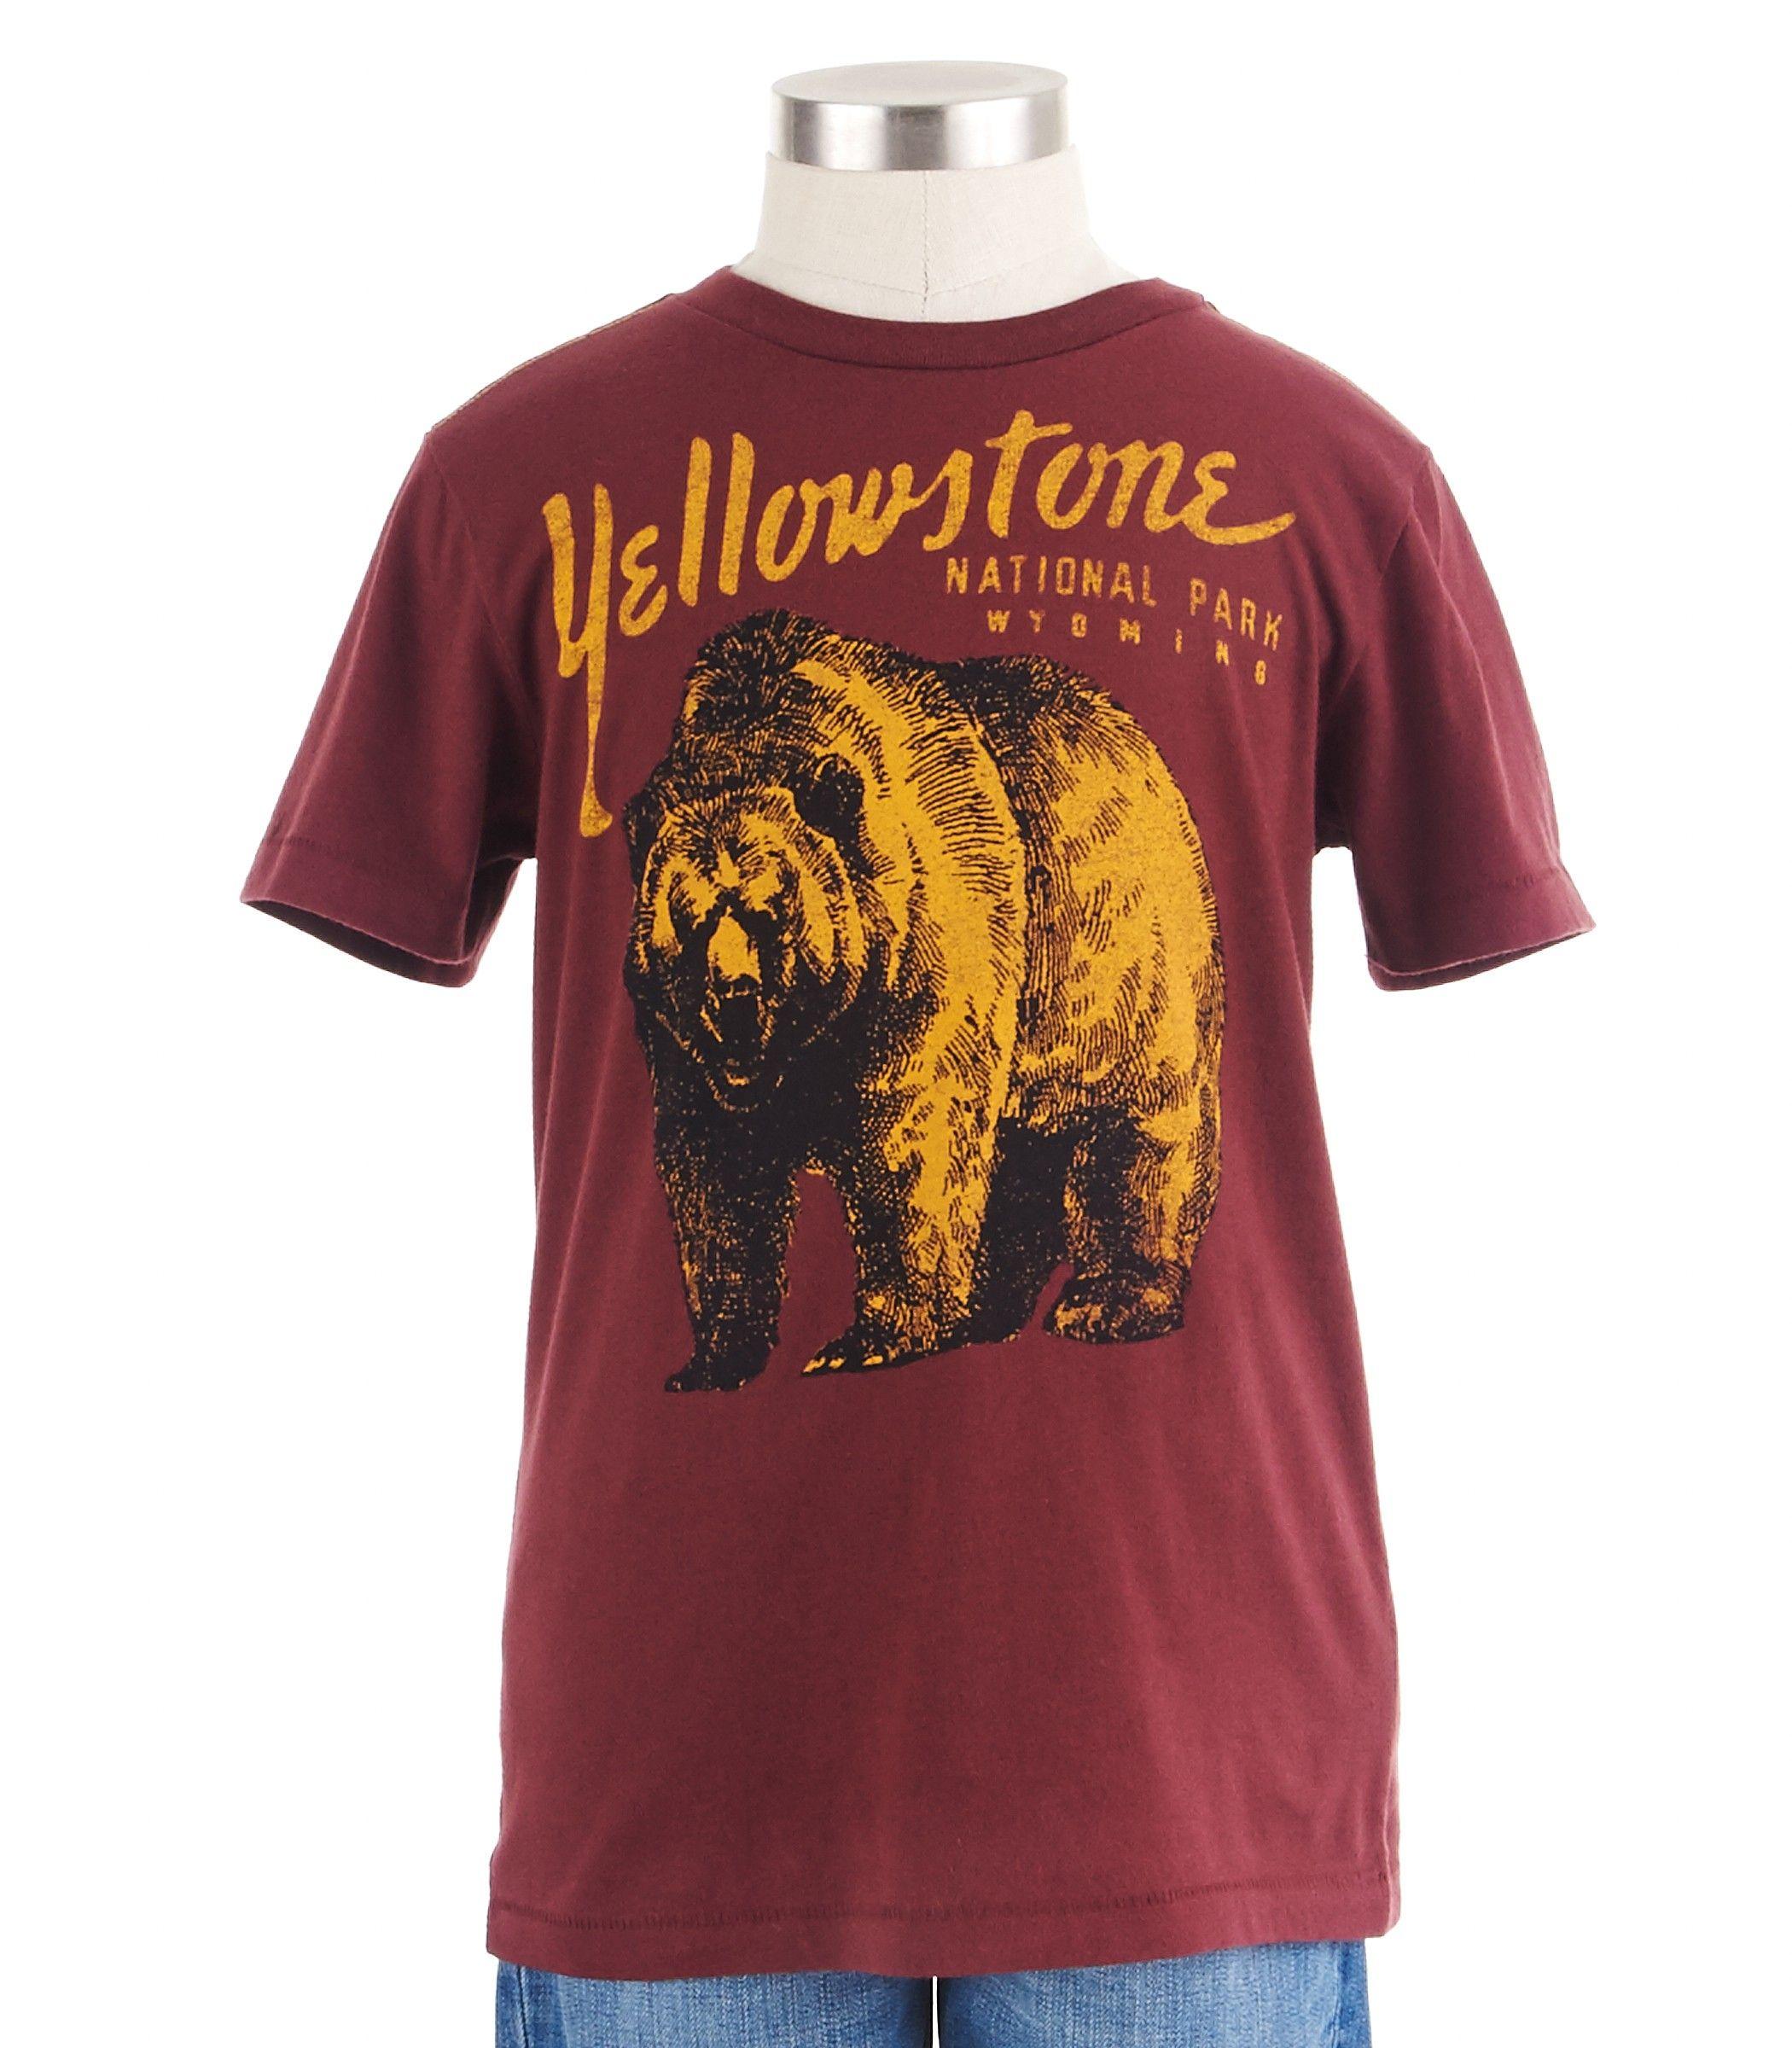 Yellowstone Tee - Shirts & Tees - Shop - boys | Peek Kids Clothing